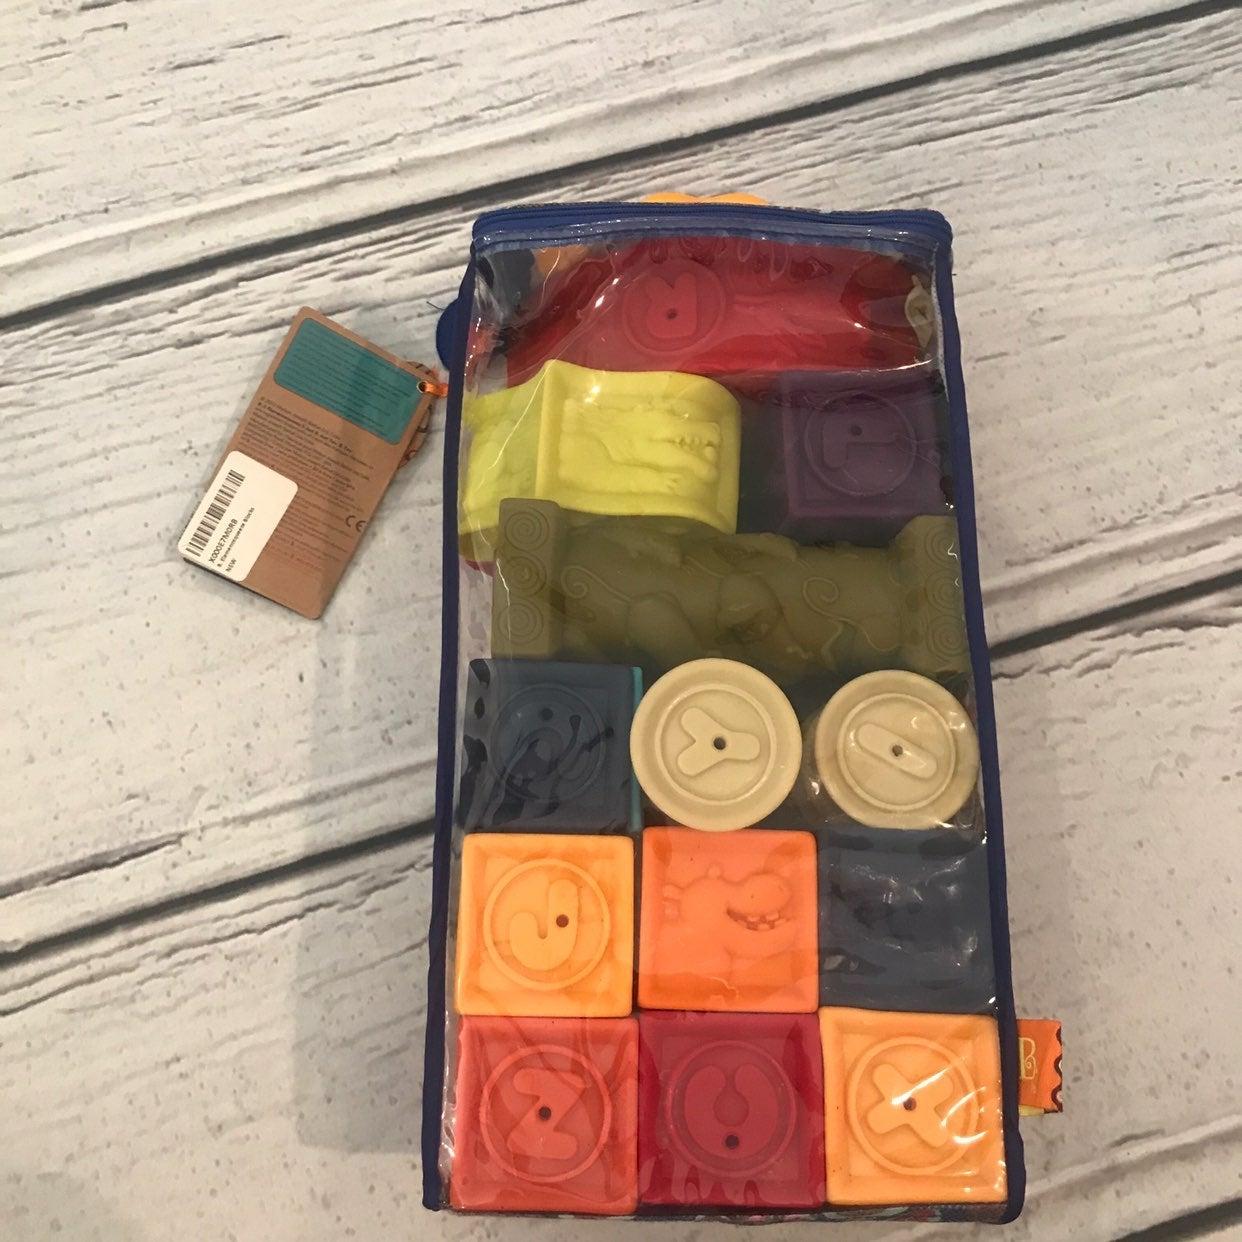 B Toys alphabet squeeze blocks